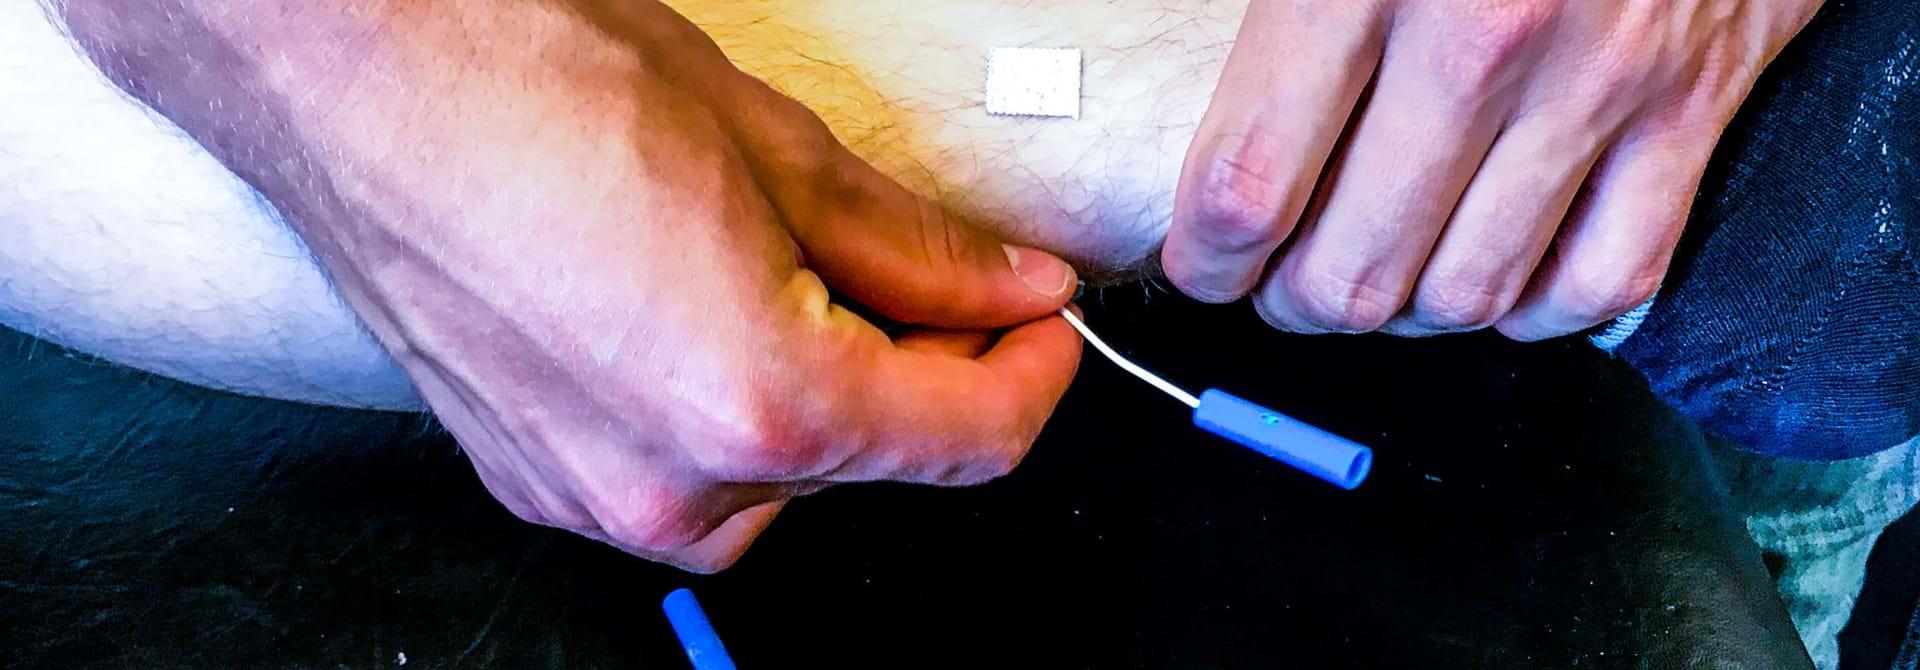 Elektrode Ben Web